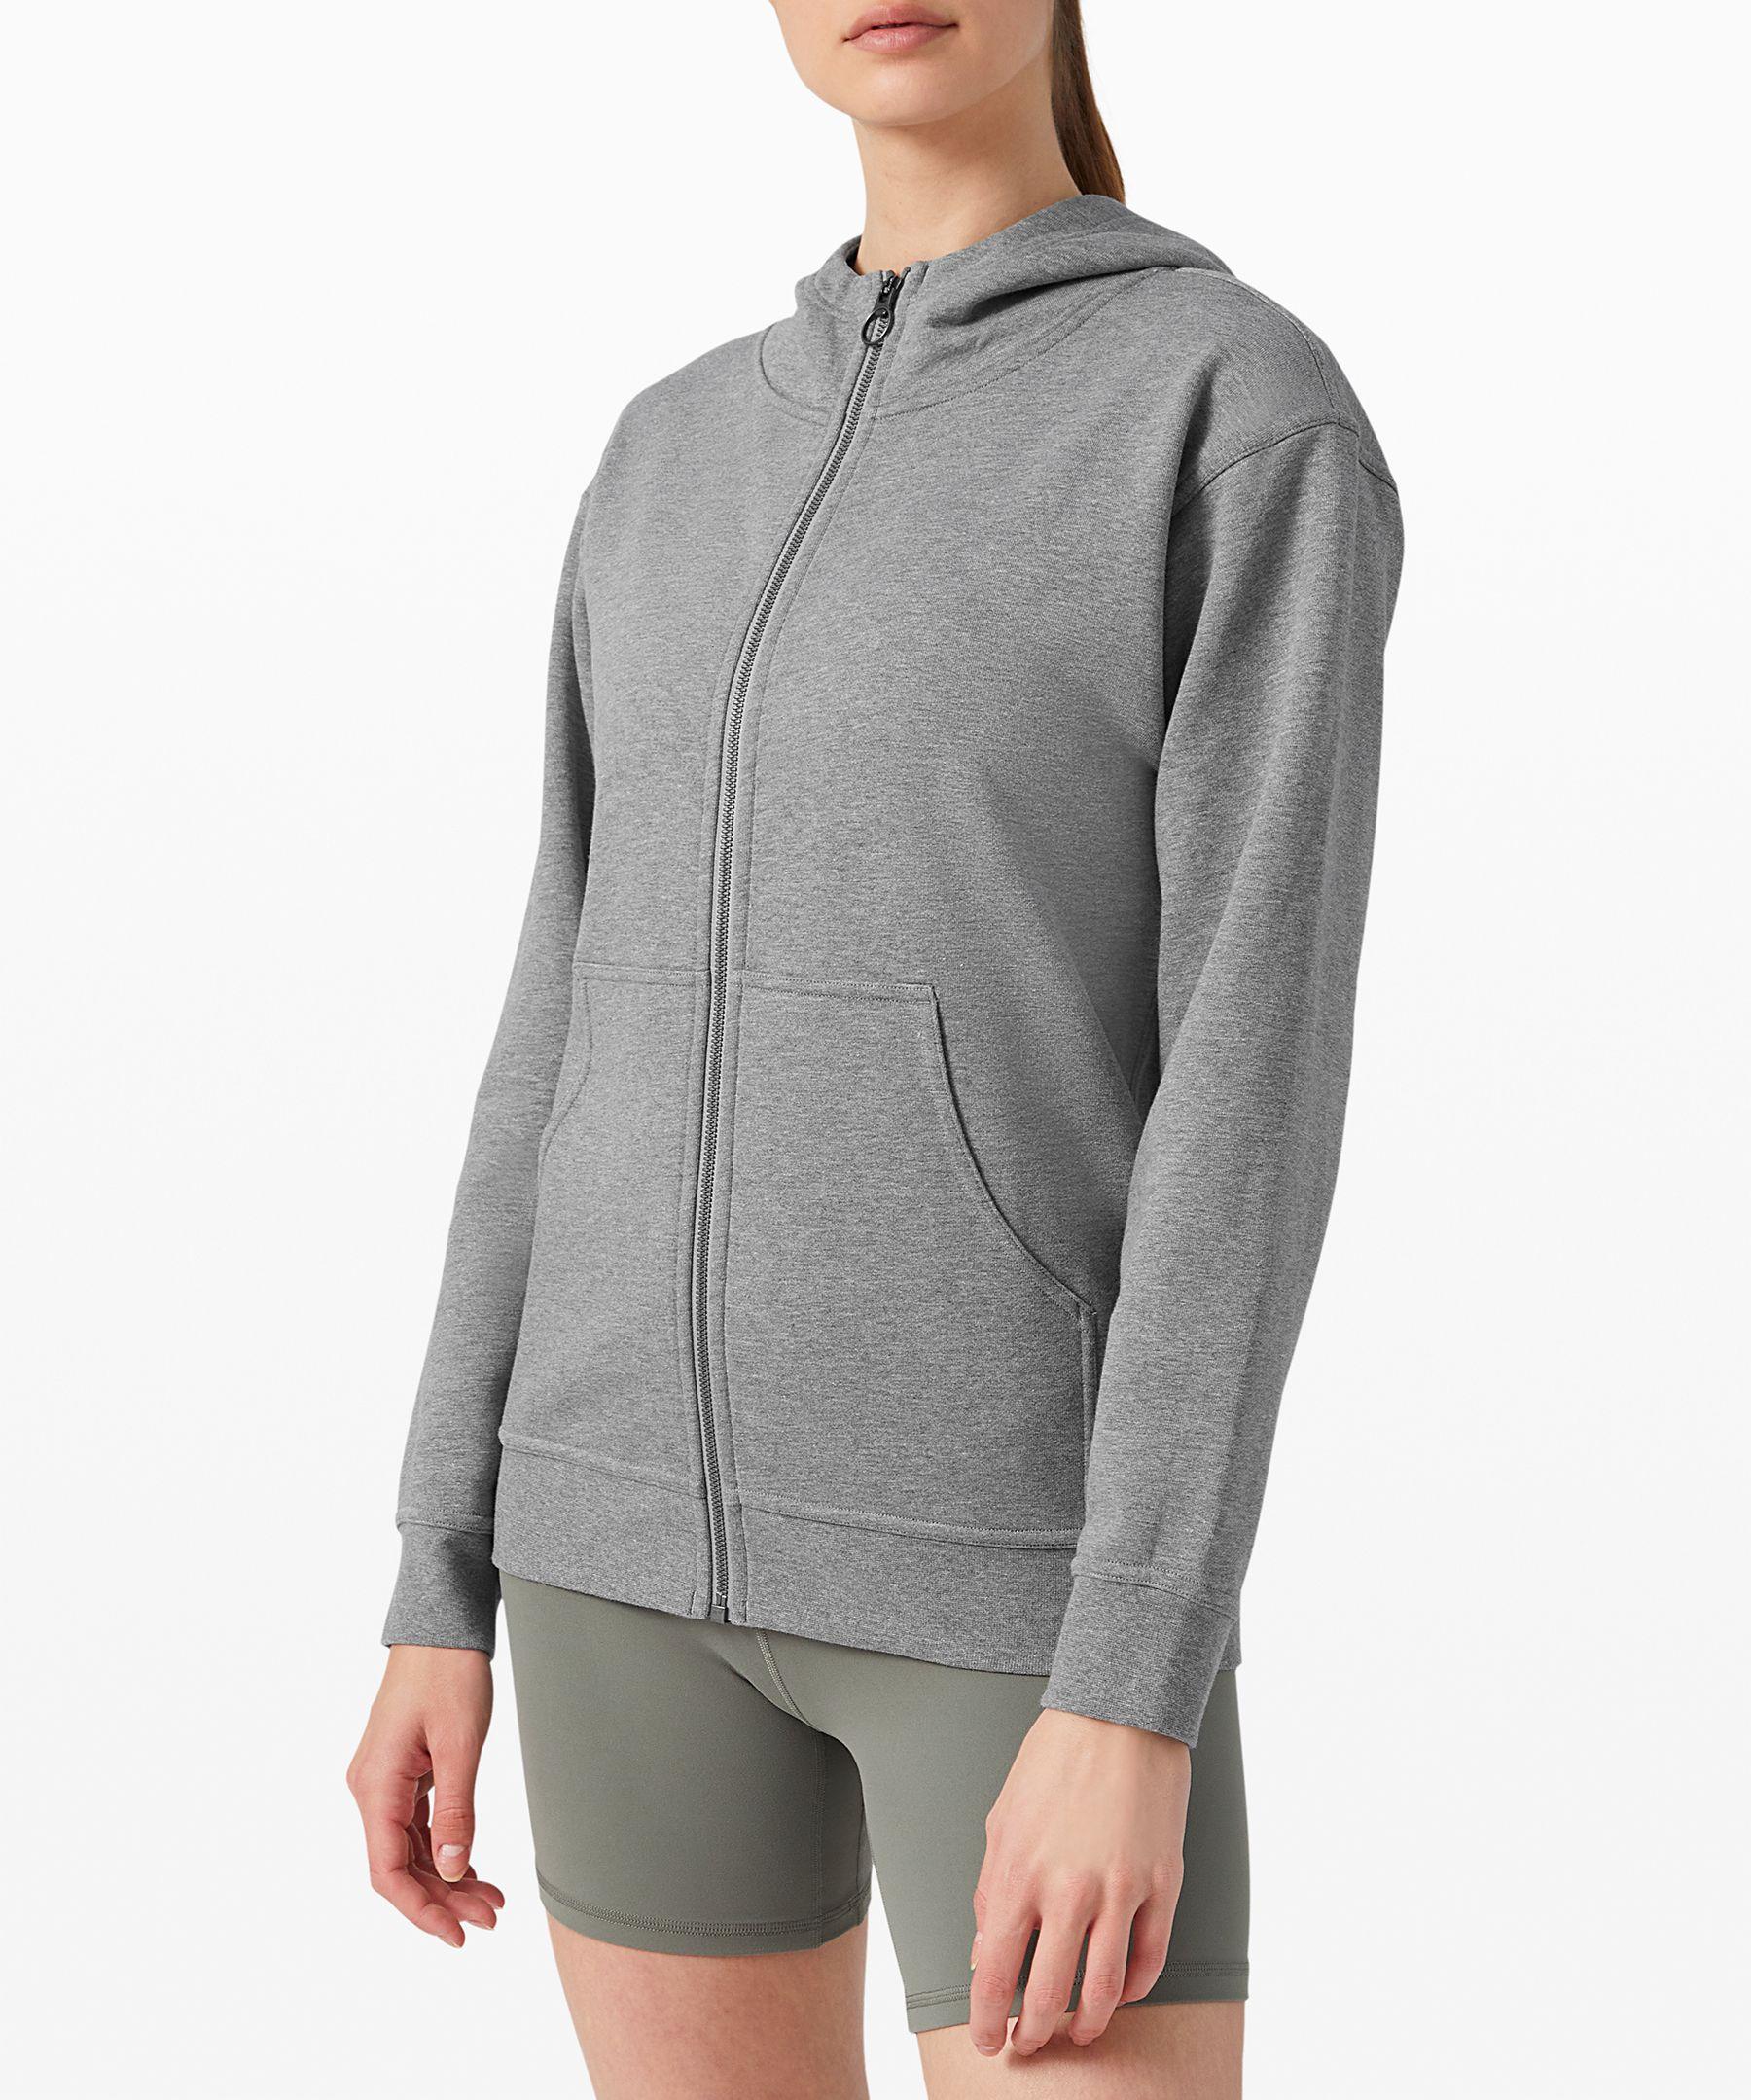 We designed this zip hoodie  for the ultimate post-practice  comfort.